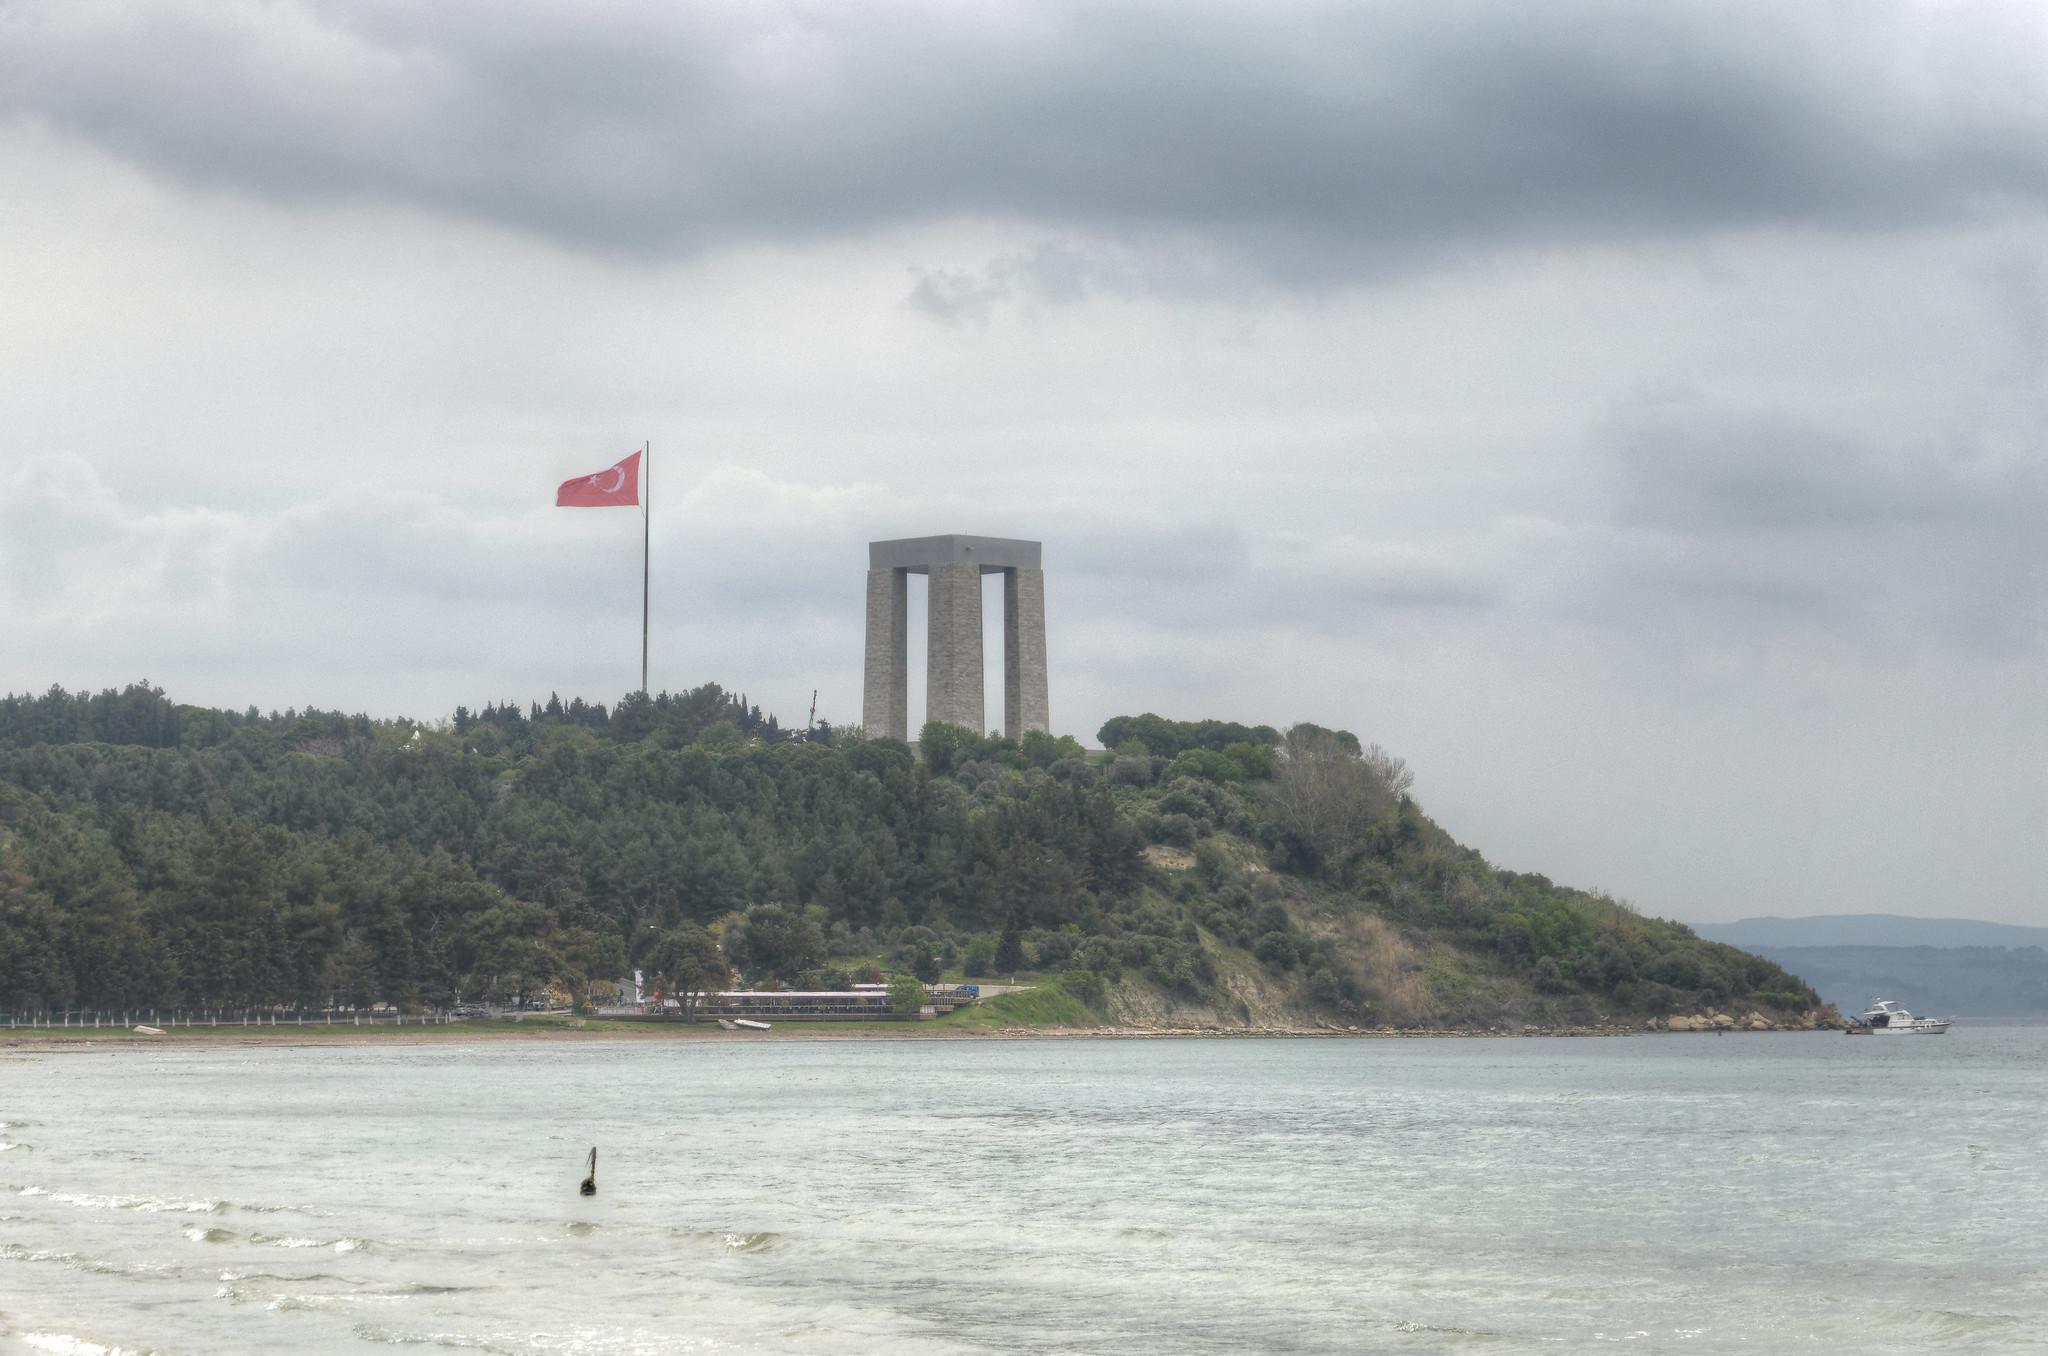 13-Turkey 25.04.2015 08-26-44 25.04.2015 10-35-38.2015 10-35-38